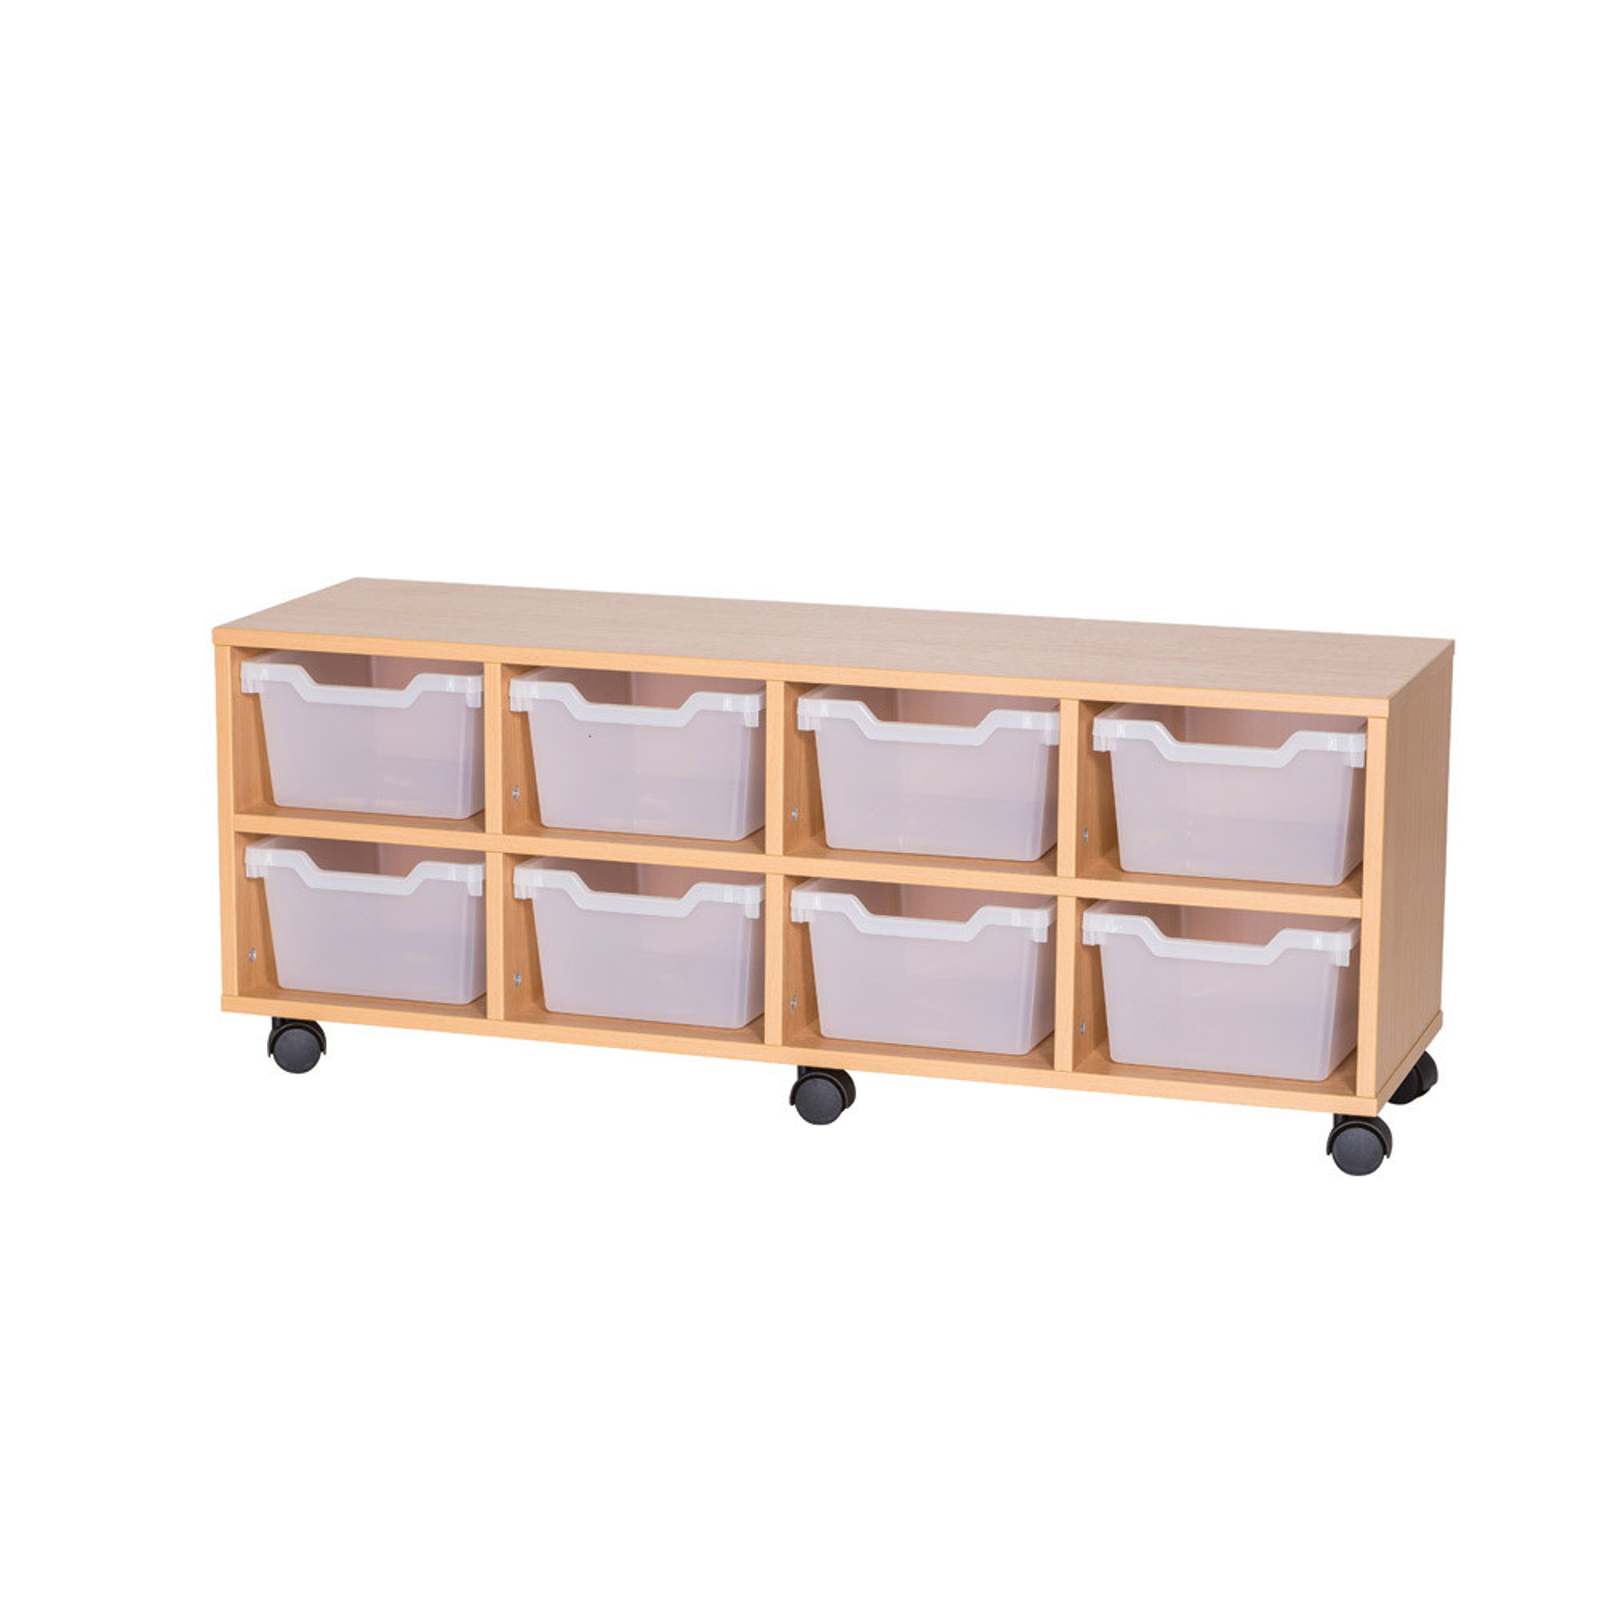 Cubby Tray Storage: 2 Tier with 8 Trays